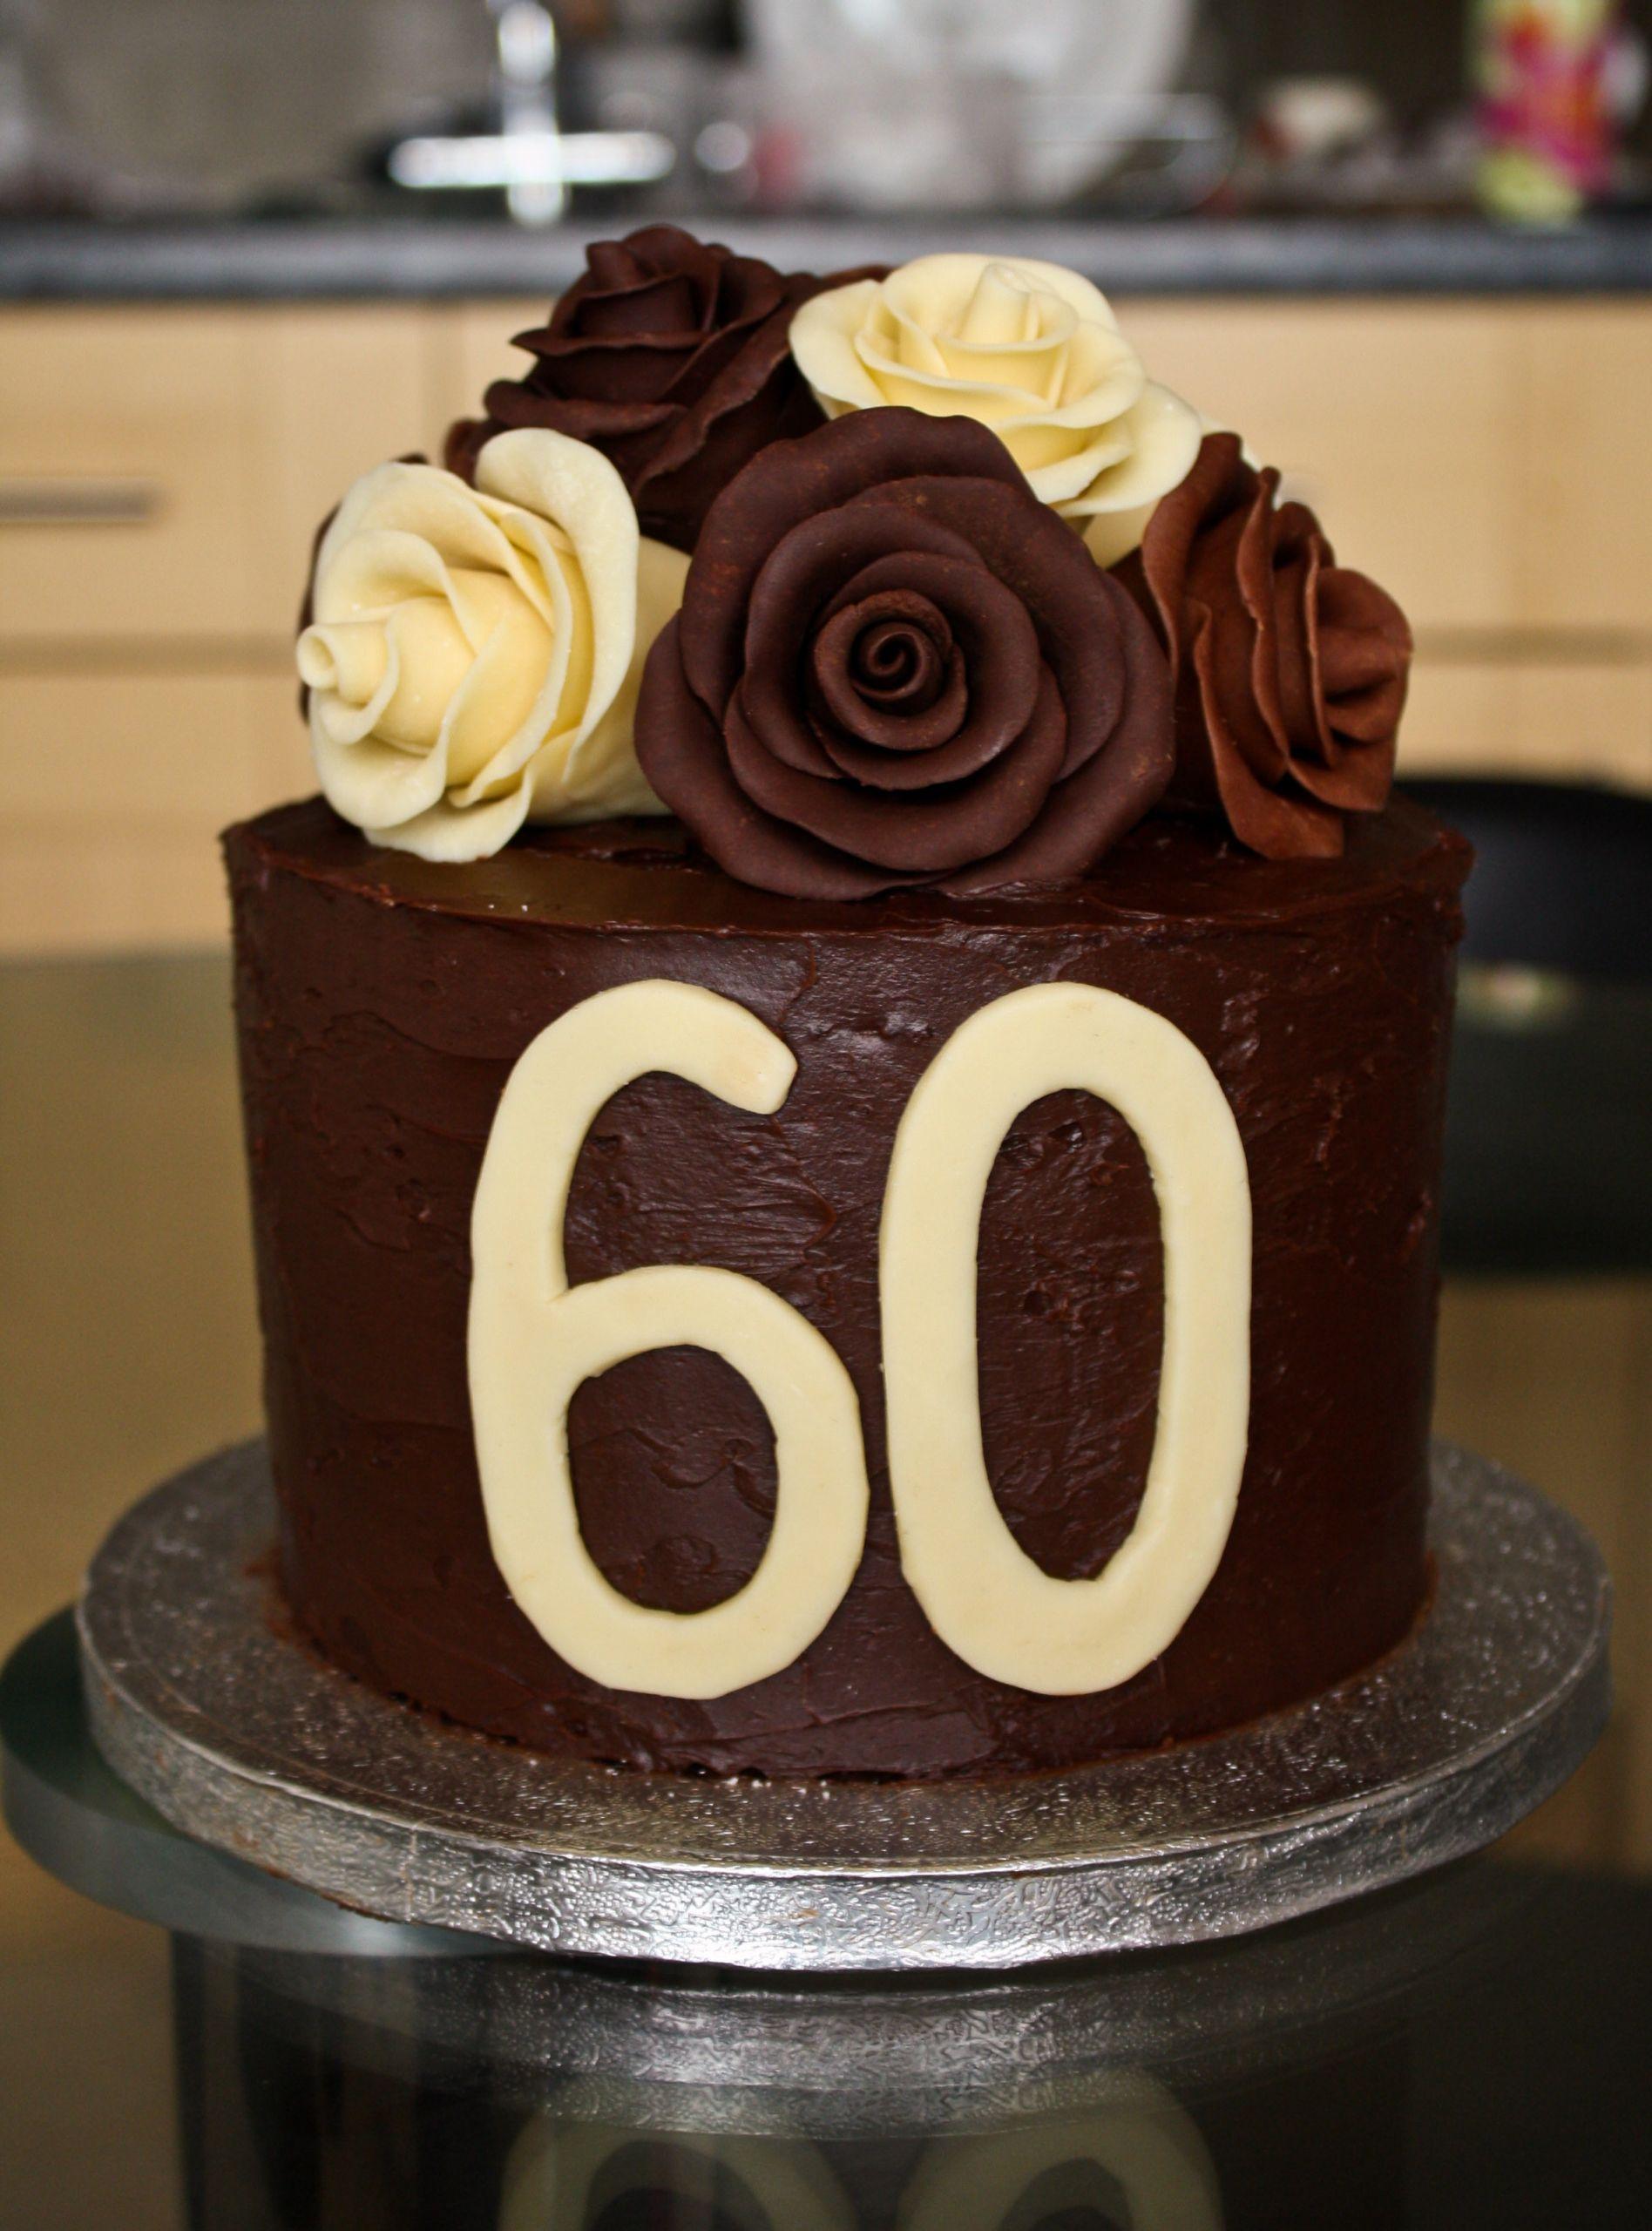 60th Birthday Cake Ideas  Chocolate Roses Birthday Cake